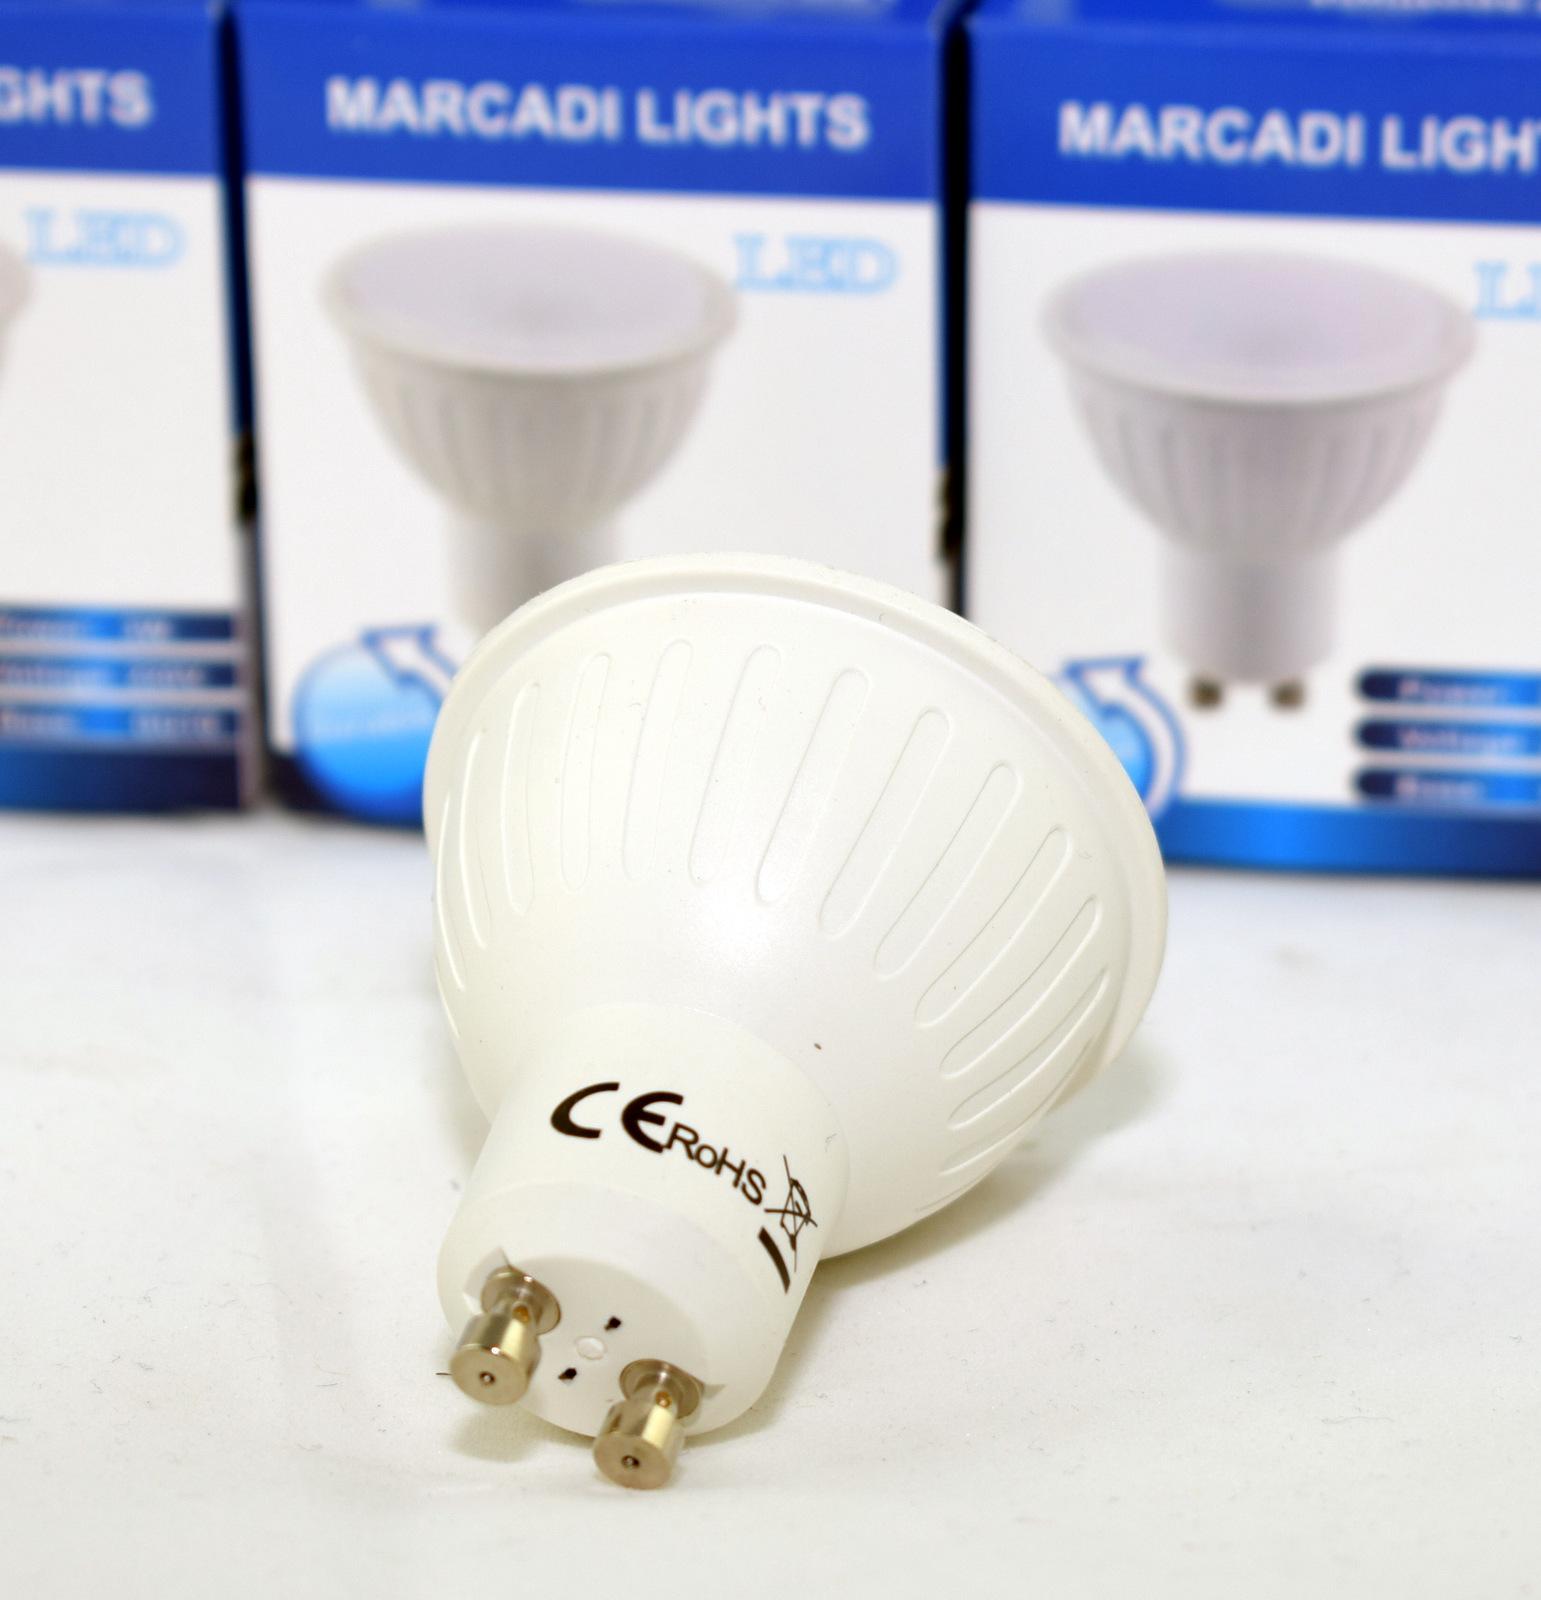 gu10 3 watt lampe leuchtmittel strahler spot mr16 240 lumen 3000k warmwei leuchtmittel gu10 led. Black Bedroom Furniture Sets. Home Design Ideas